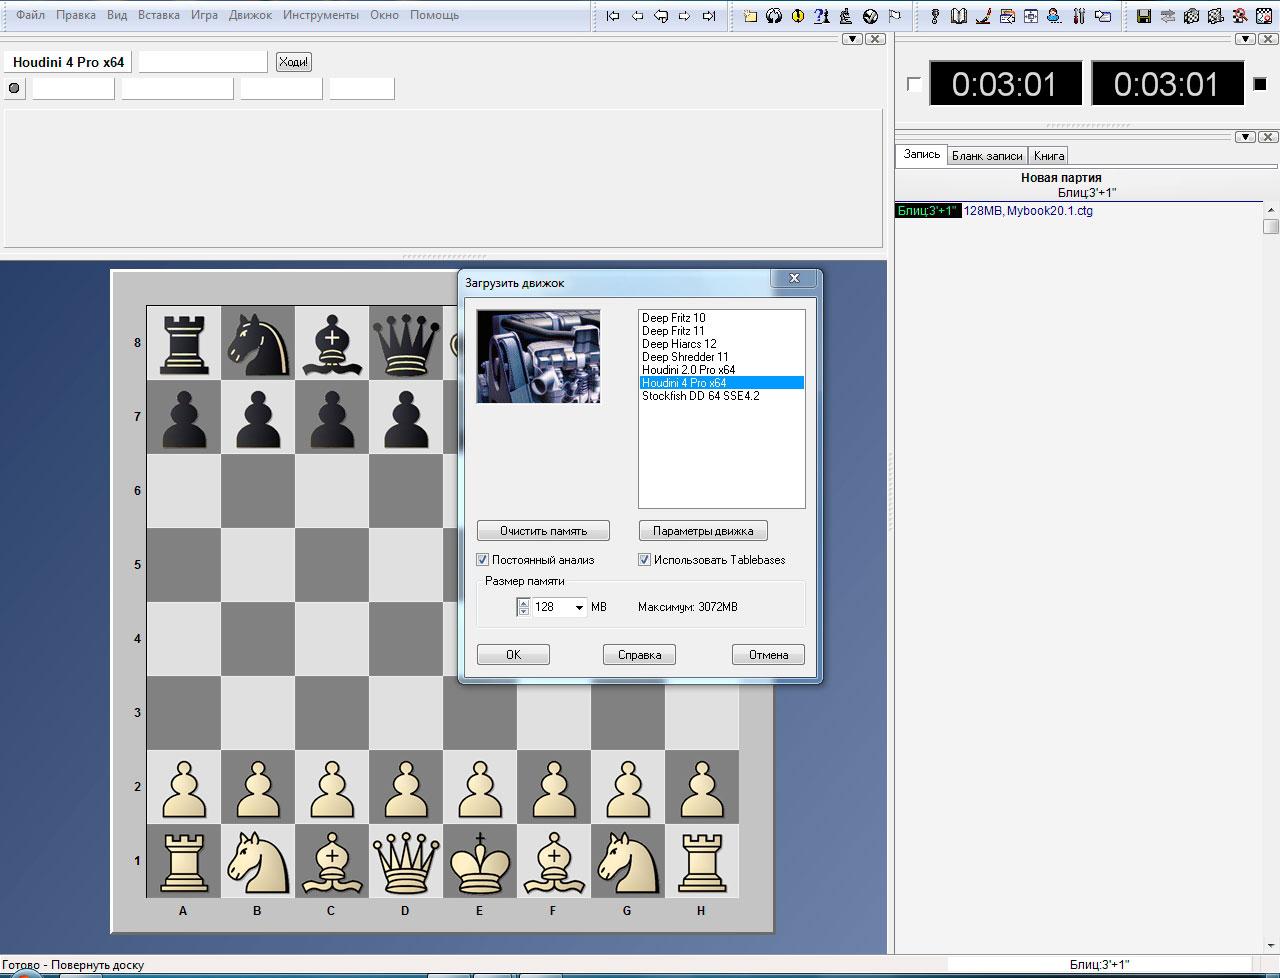 Шахматная программа гудини 4 про на русском